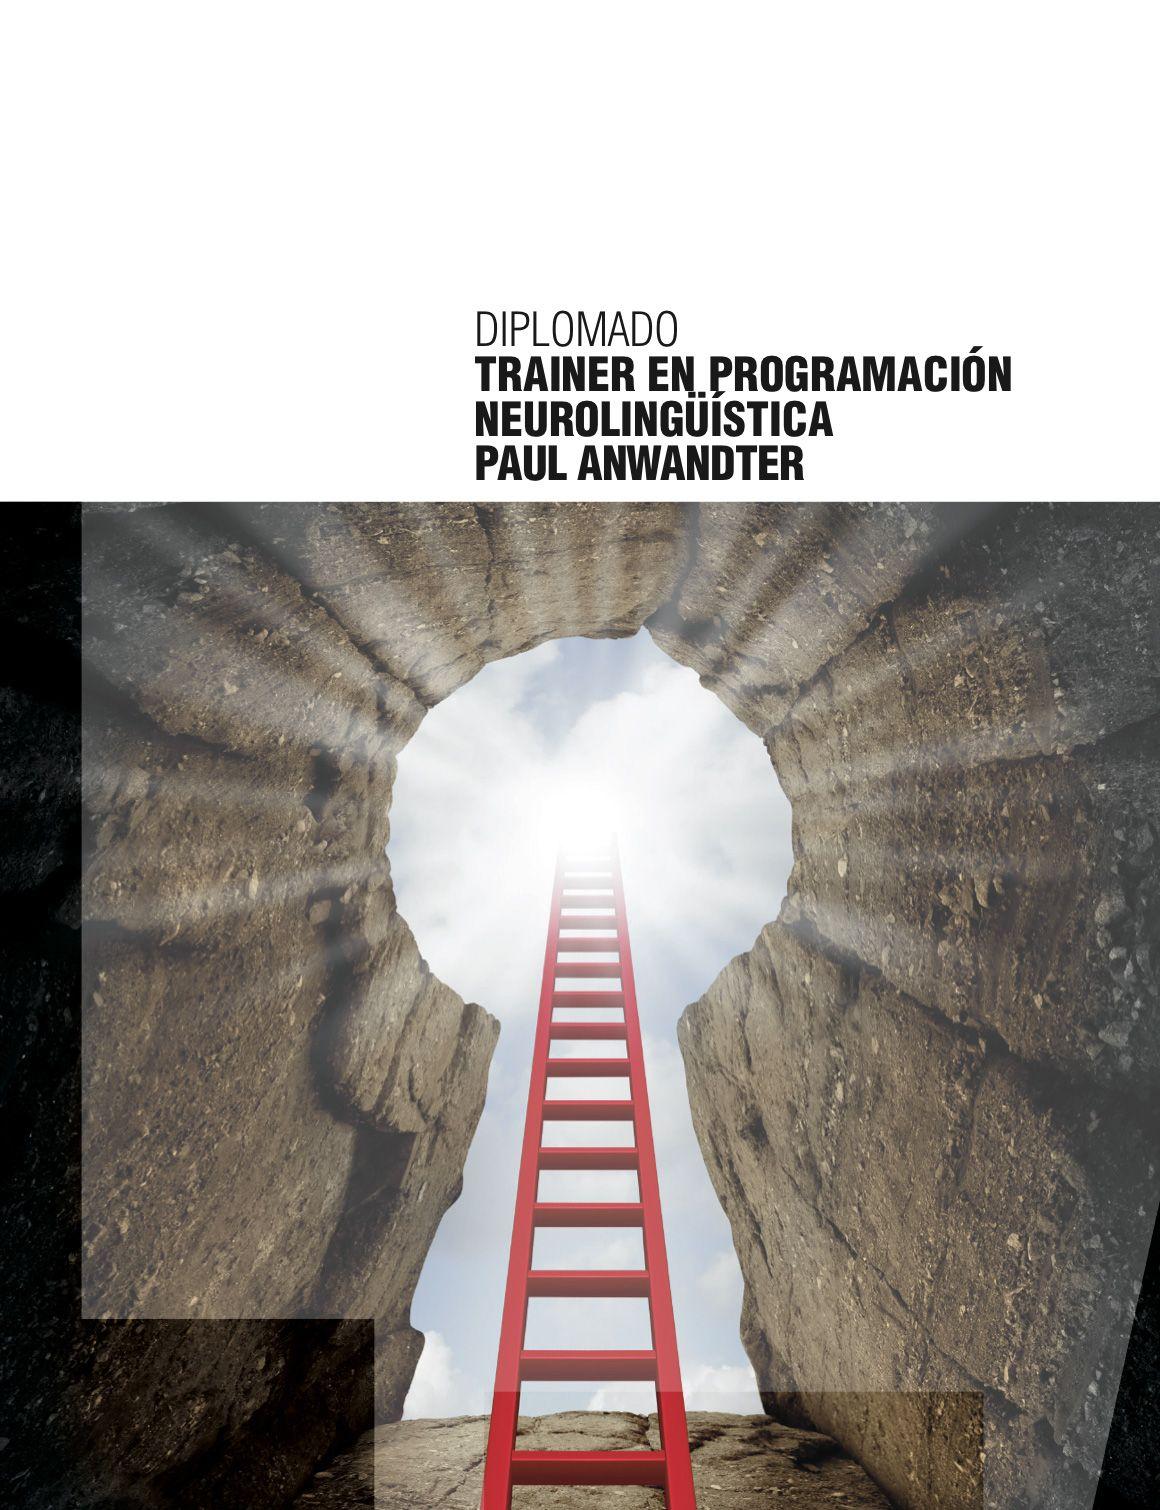 DIPLOMADO TRAINER PNL